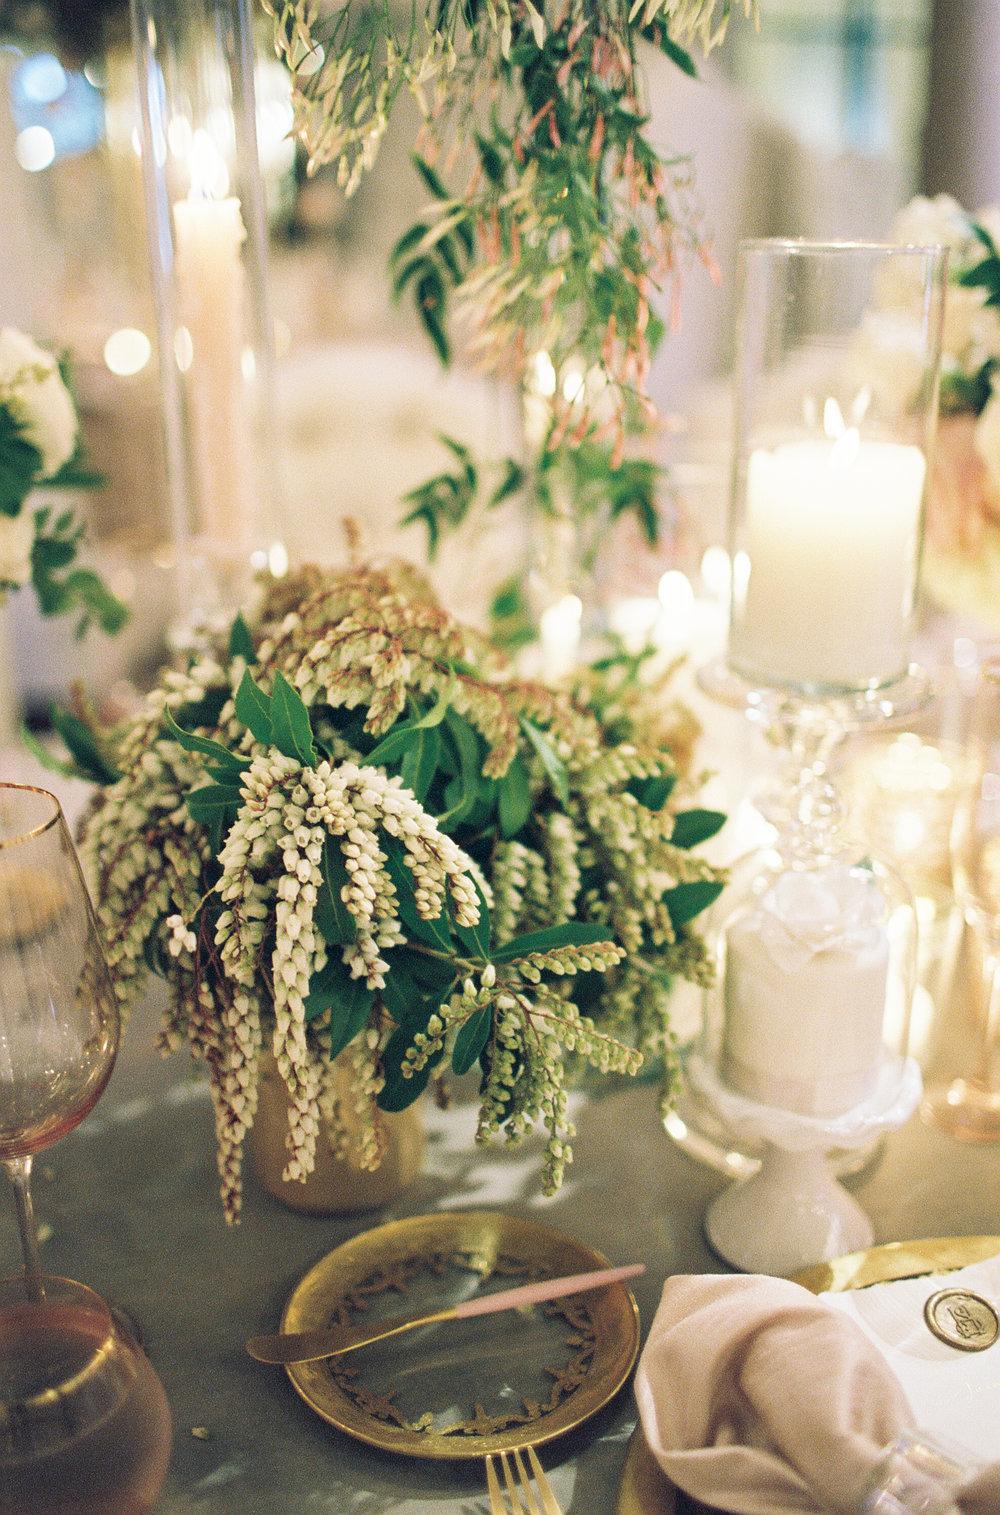 Athenaeum_Wedding_Hi_Res-90-Jen_Huang-005180-R1-030.jpg